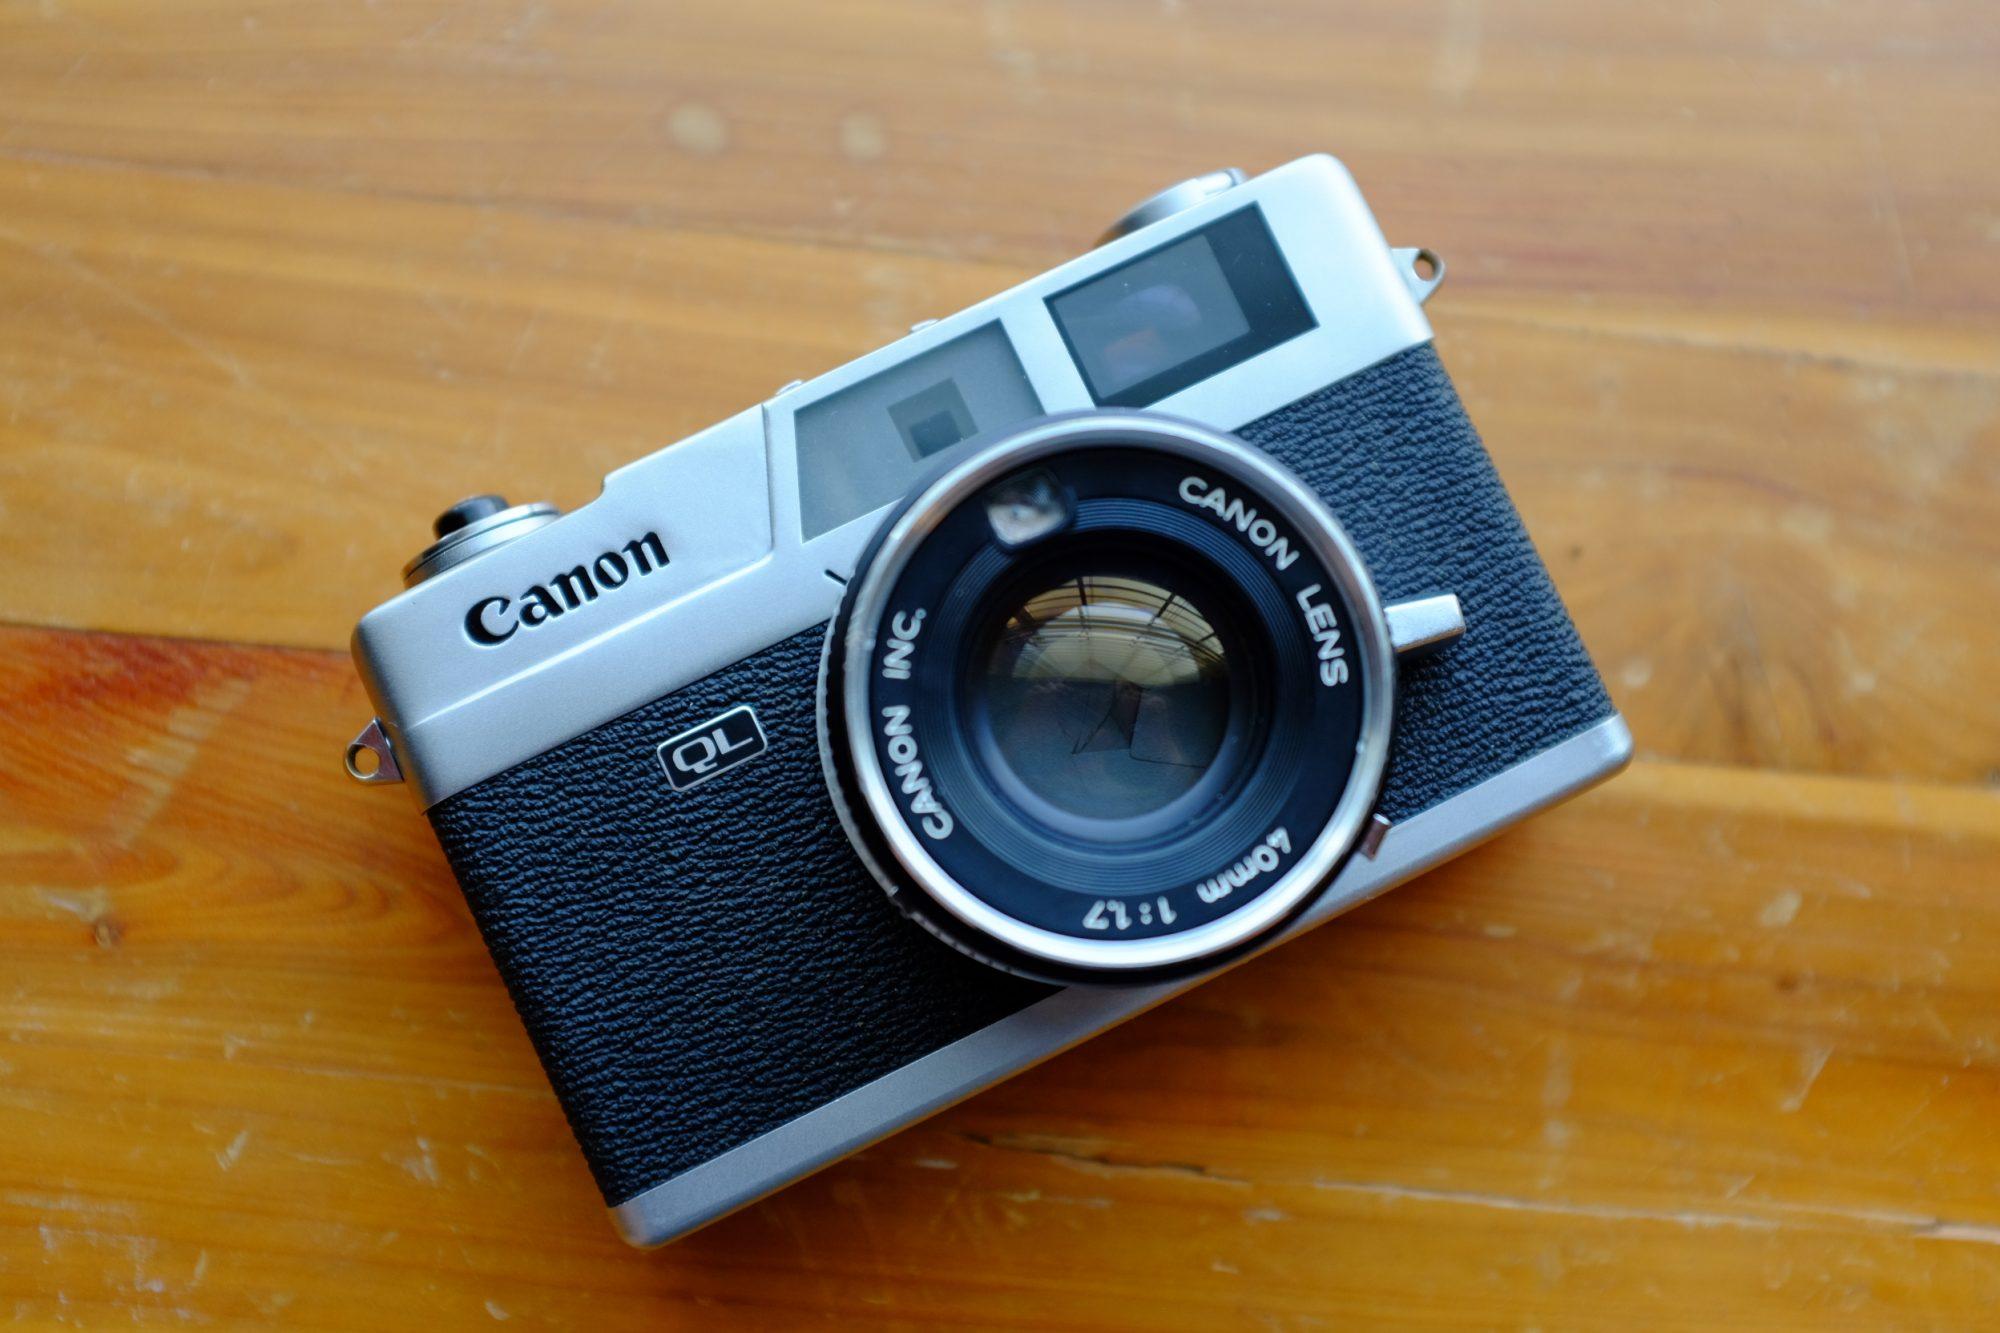 Canonet Ql 17 (Pic: Andrew Smith)